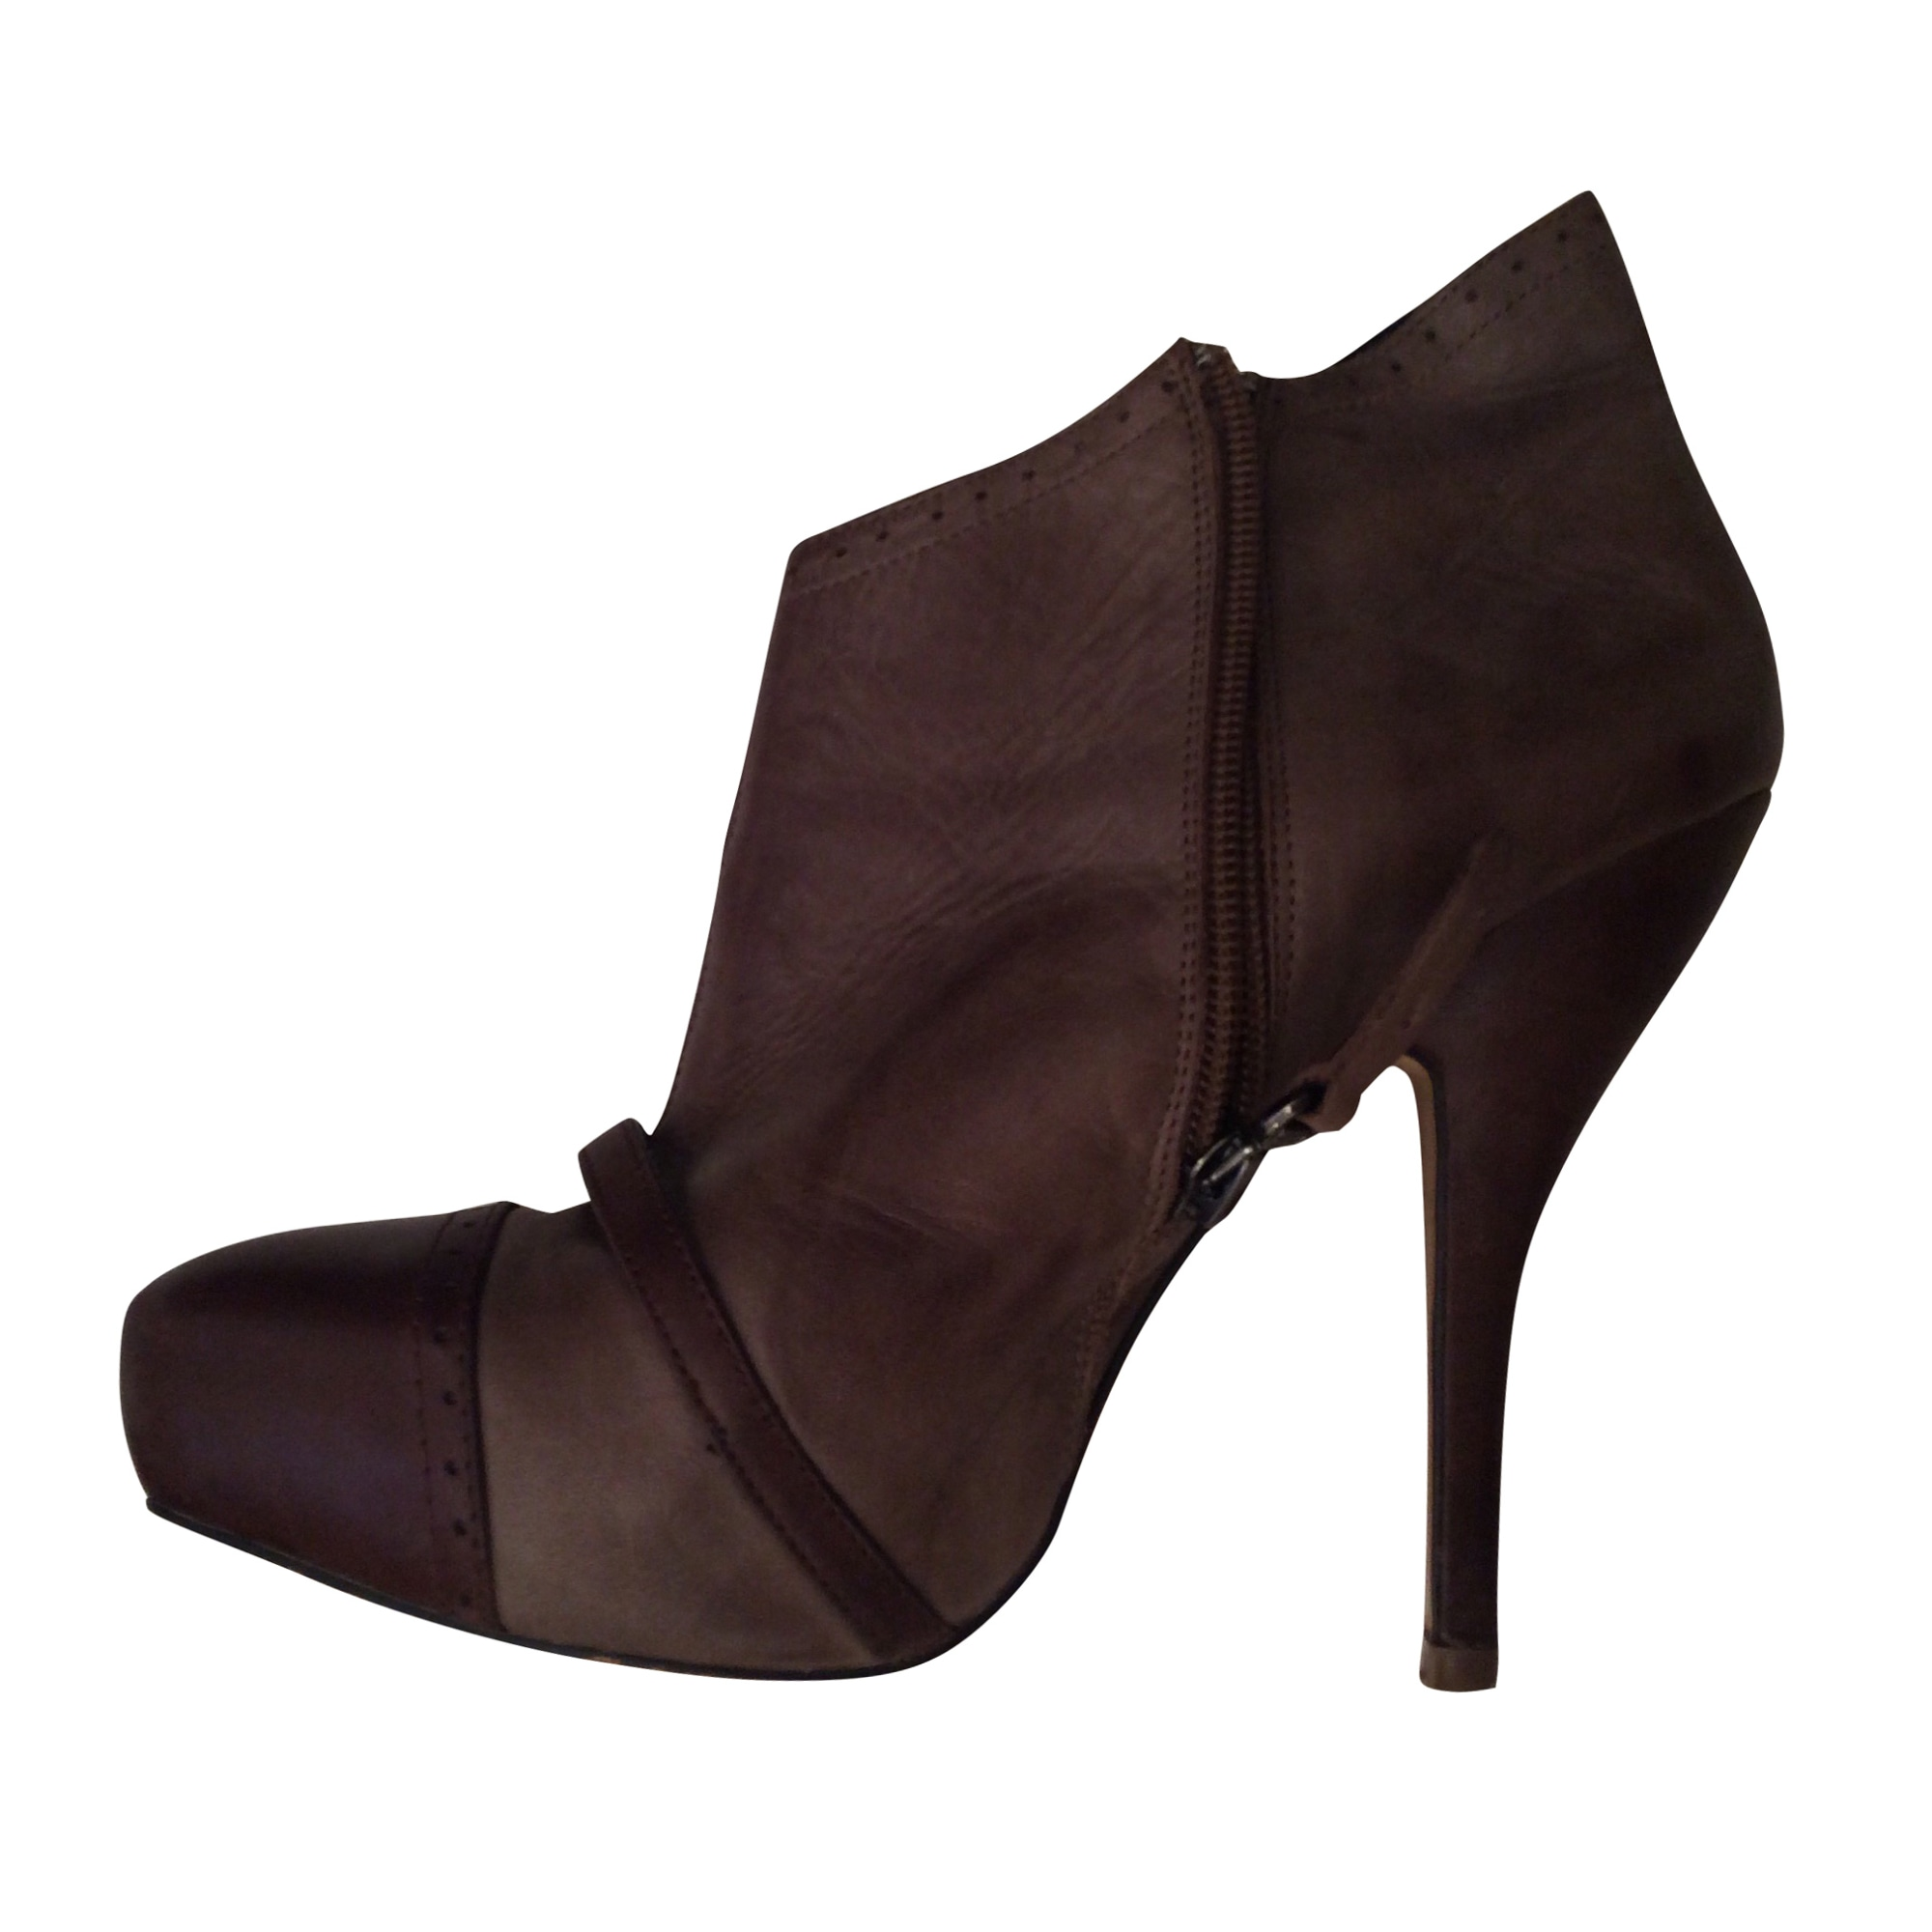 High Heel Ankle Boots ZADIG & VOLTAIRE Brown